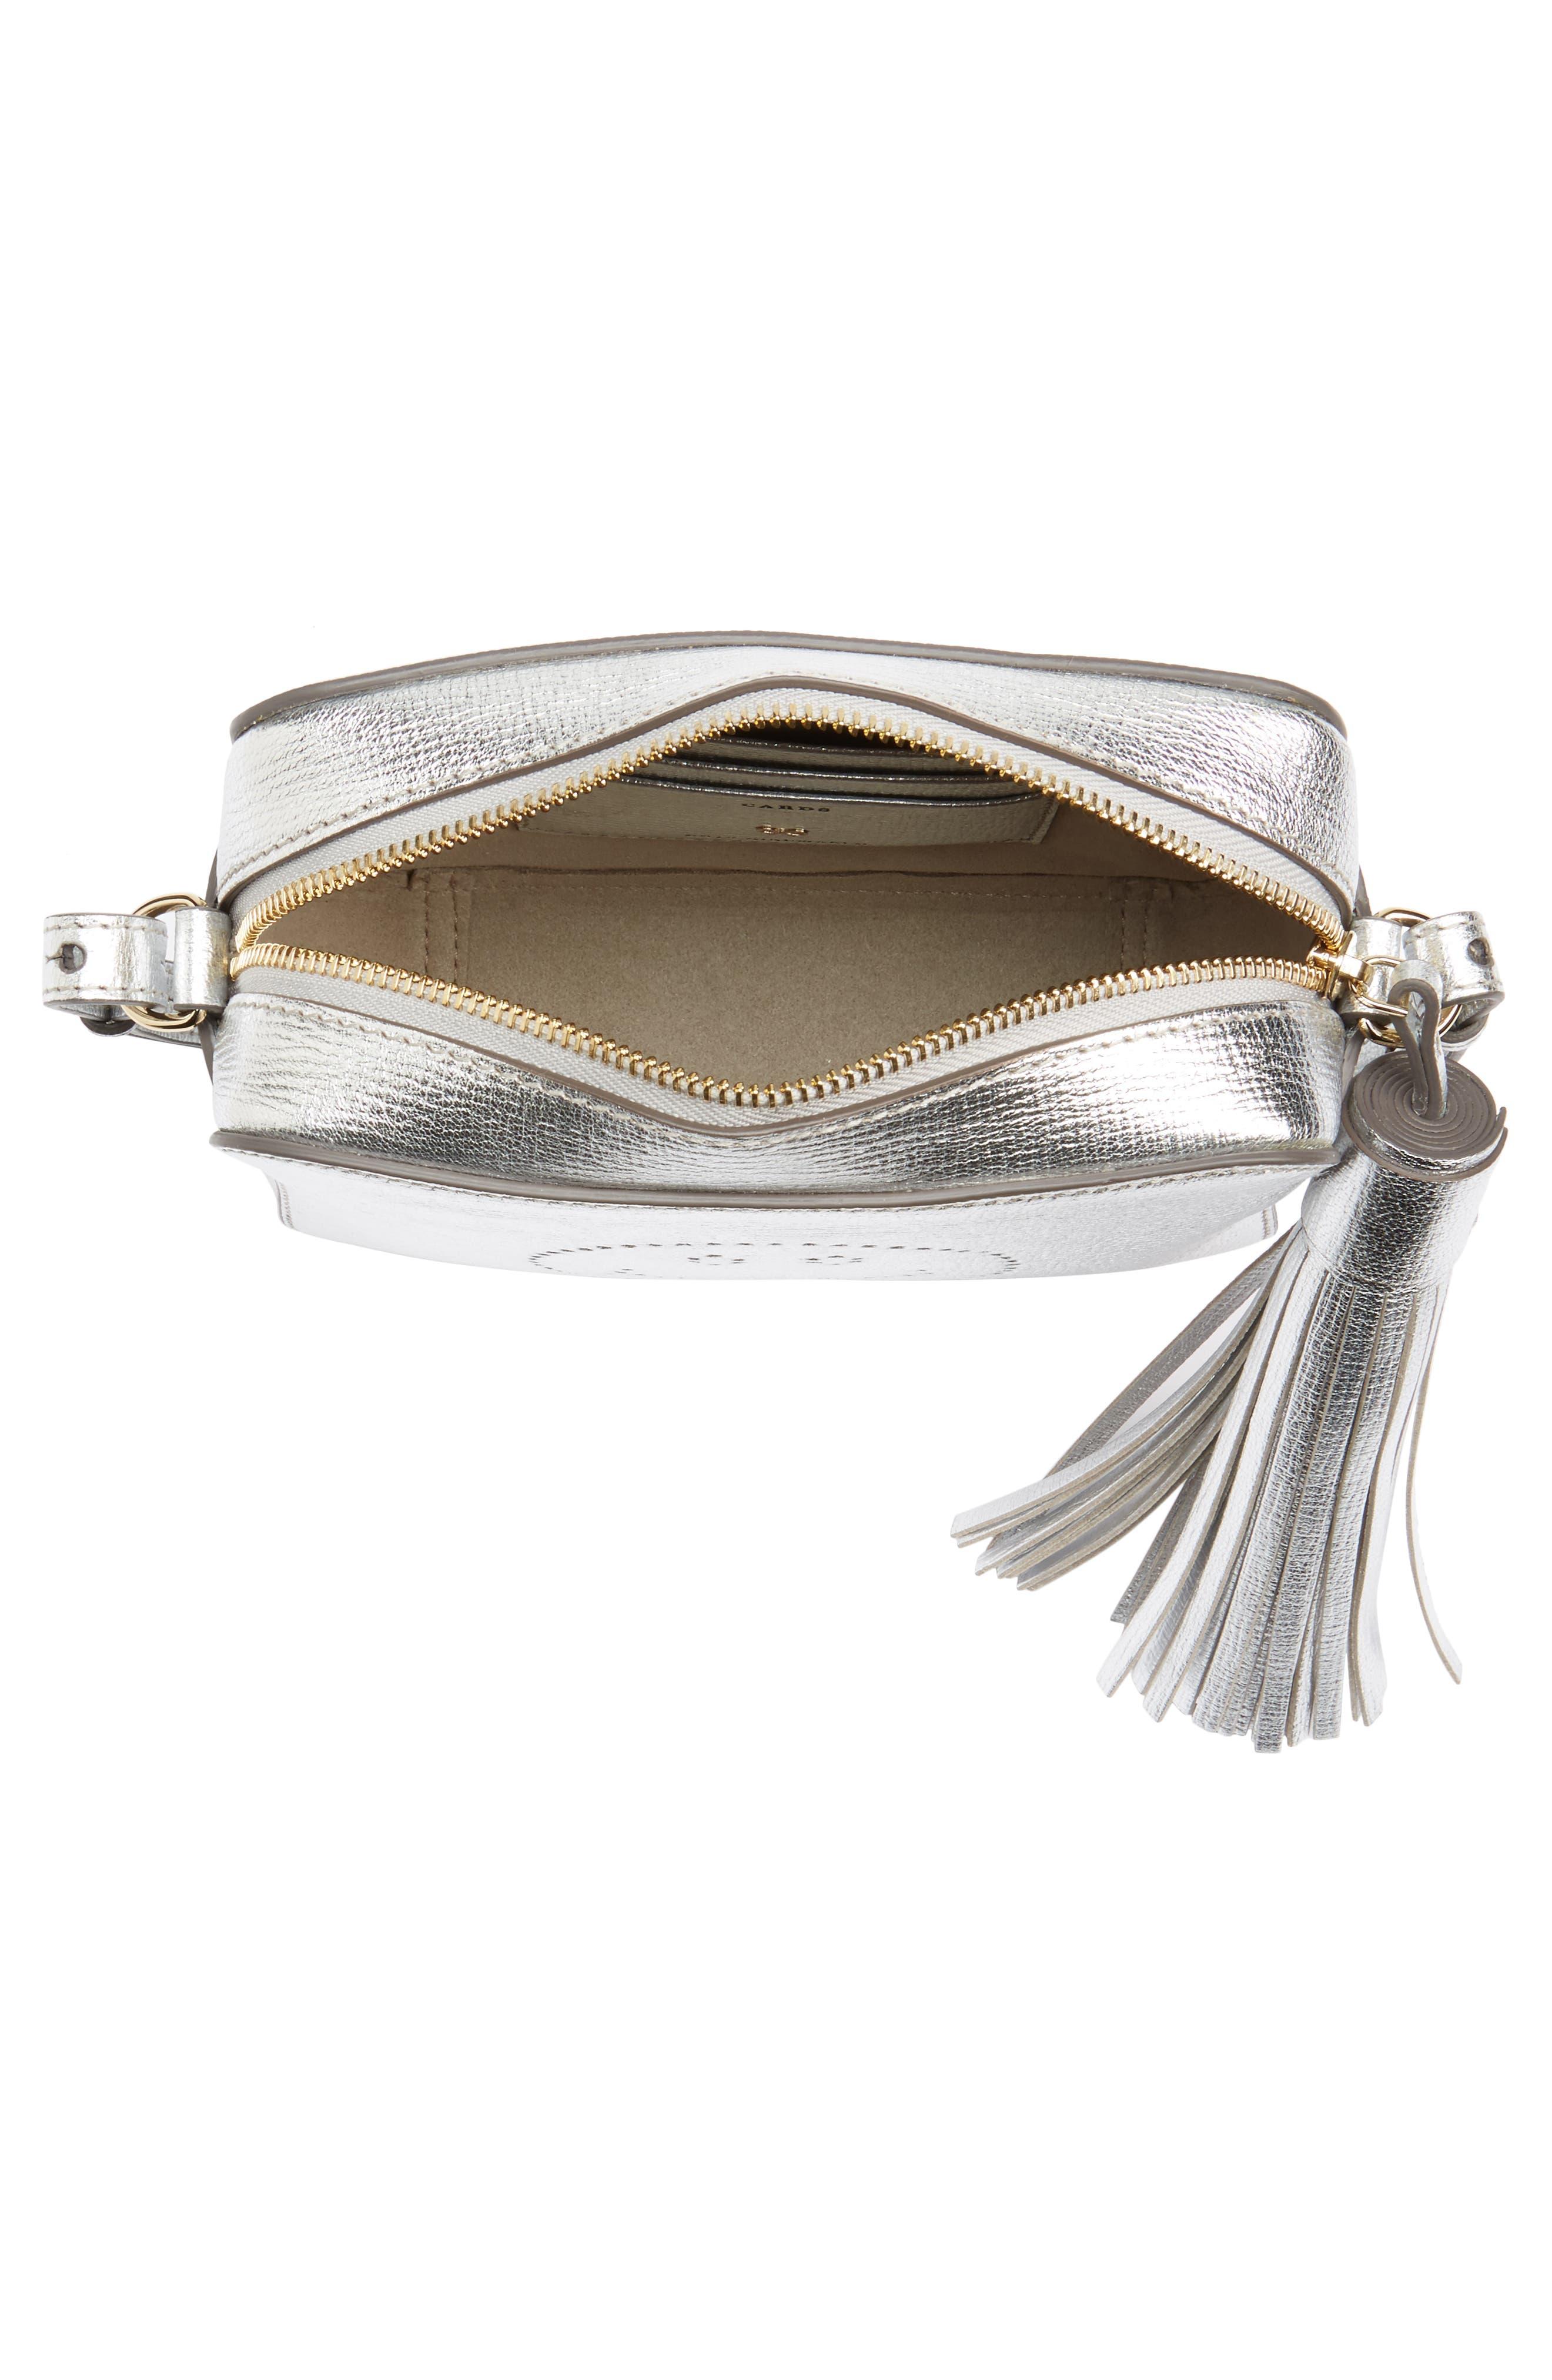 Smiley Metallic Leather Crossbody Bag,                             Alternate thumbnail 4, color,                             SILVER